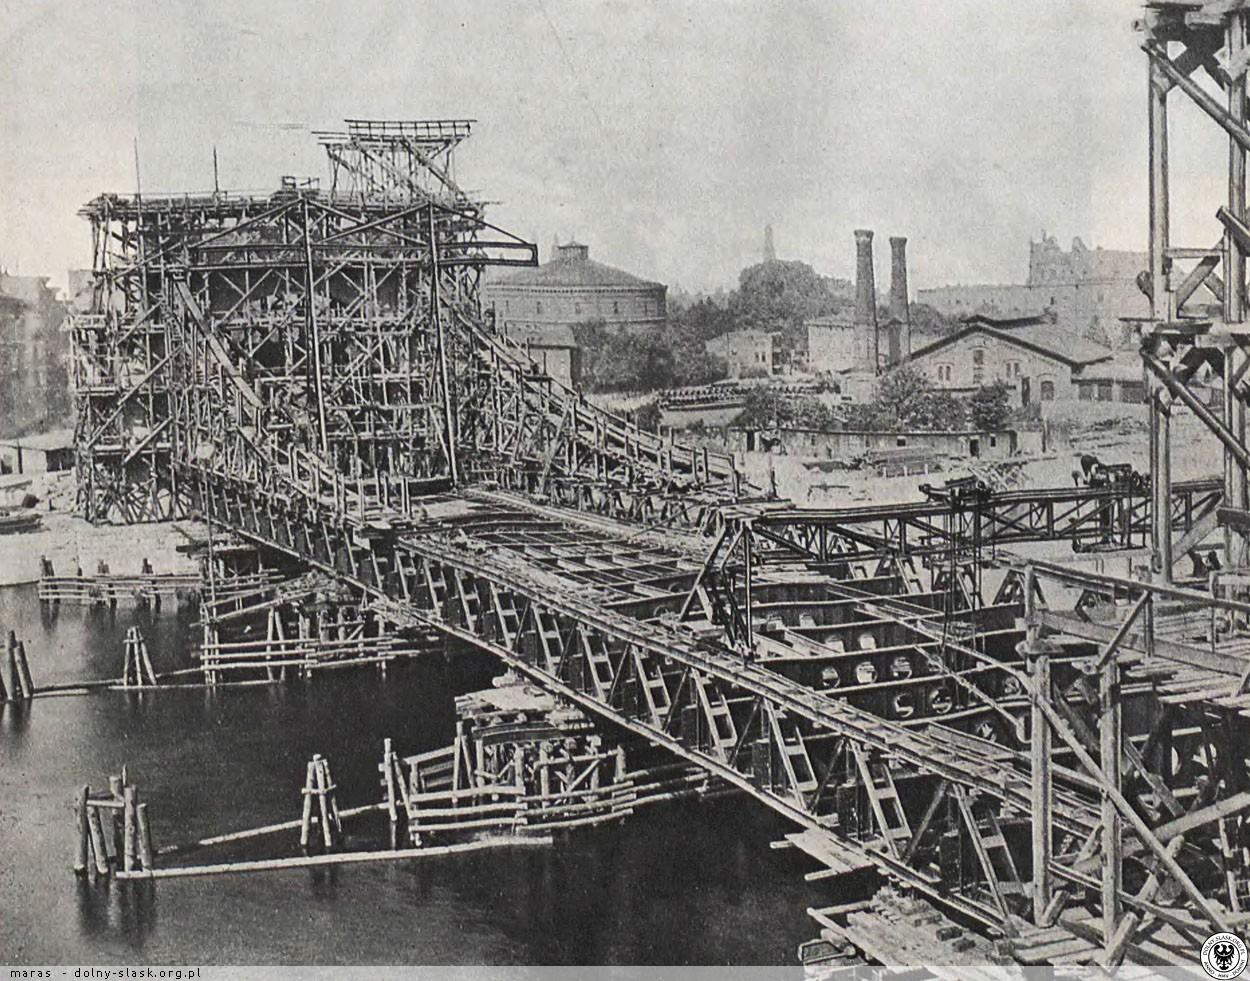 https://polska-org.pl/foto/3414/Budowa_mostu_1909_1910_Wroclaw_3414119.jpg